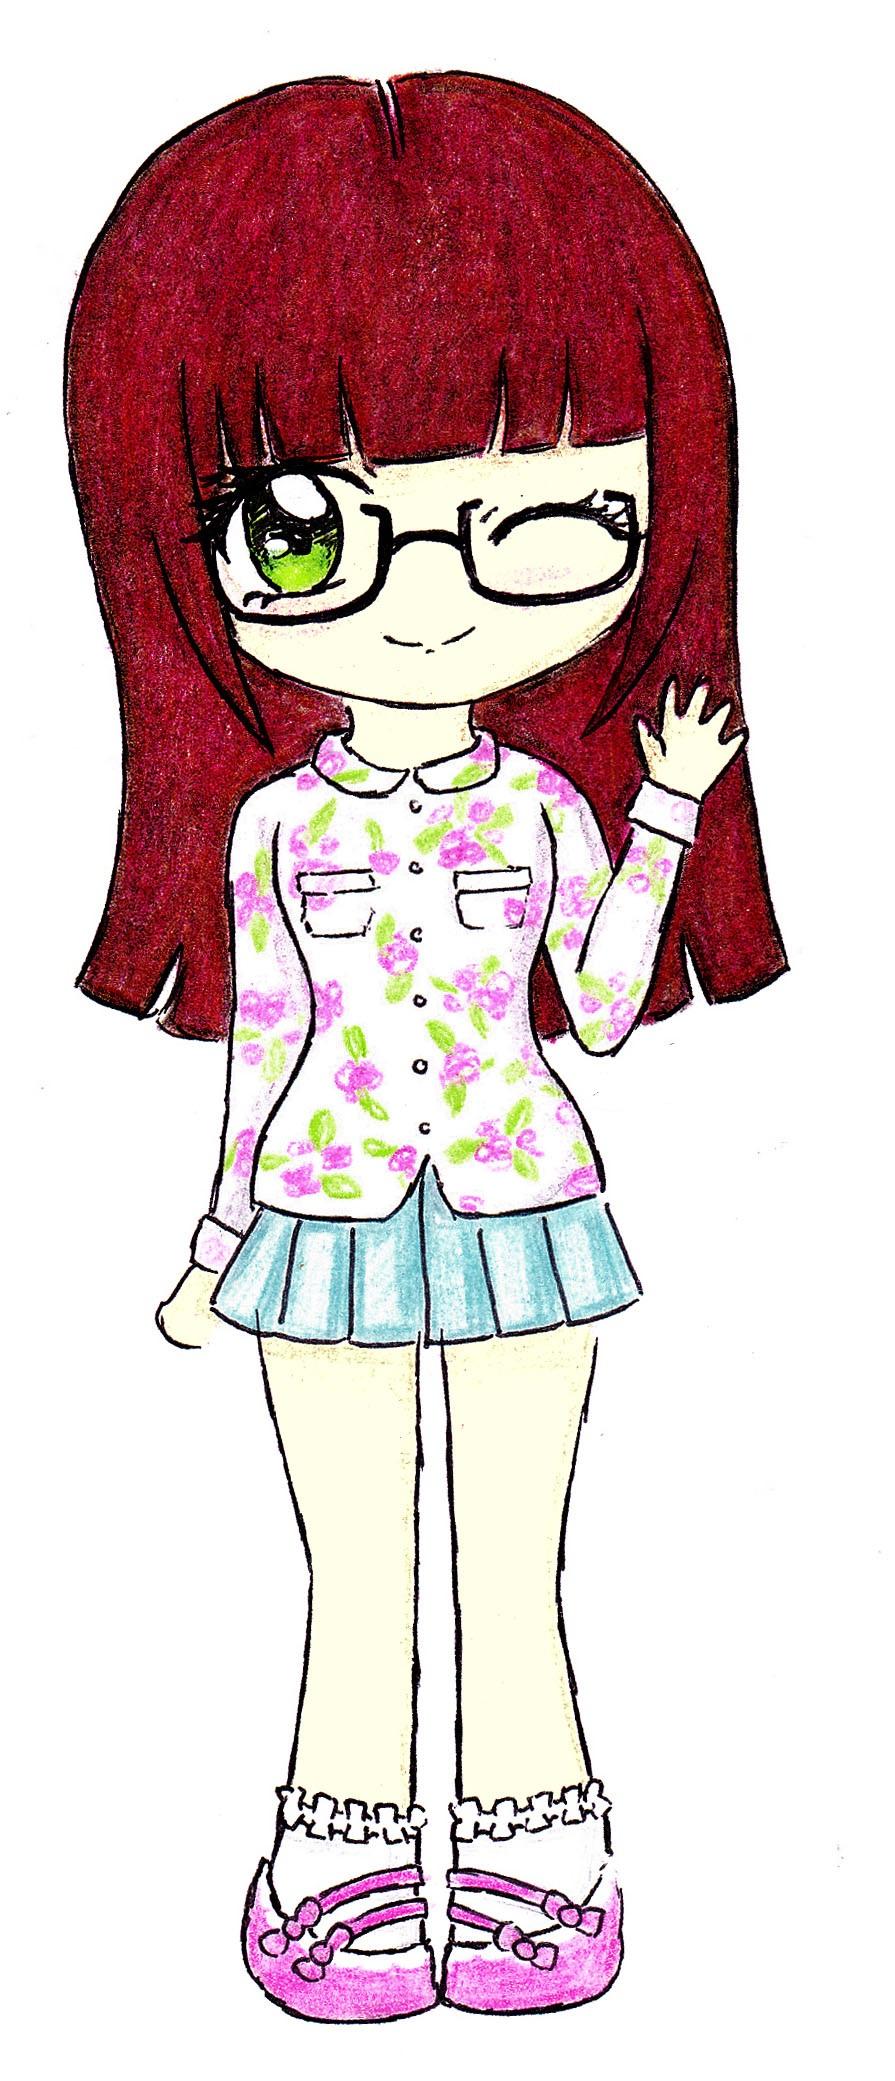 hisuikitkat's Profile Picture